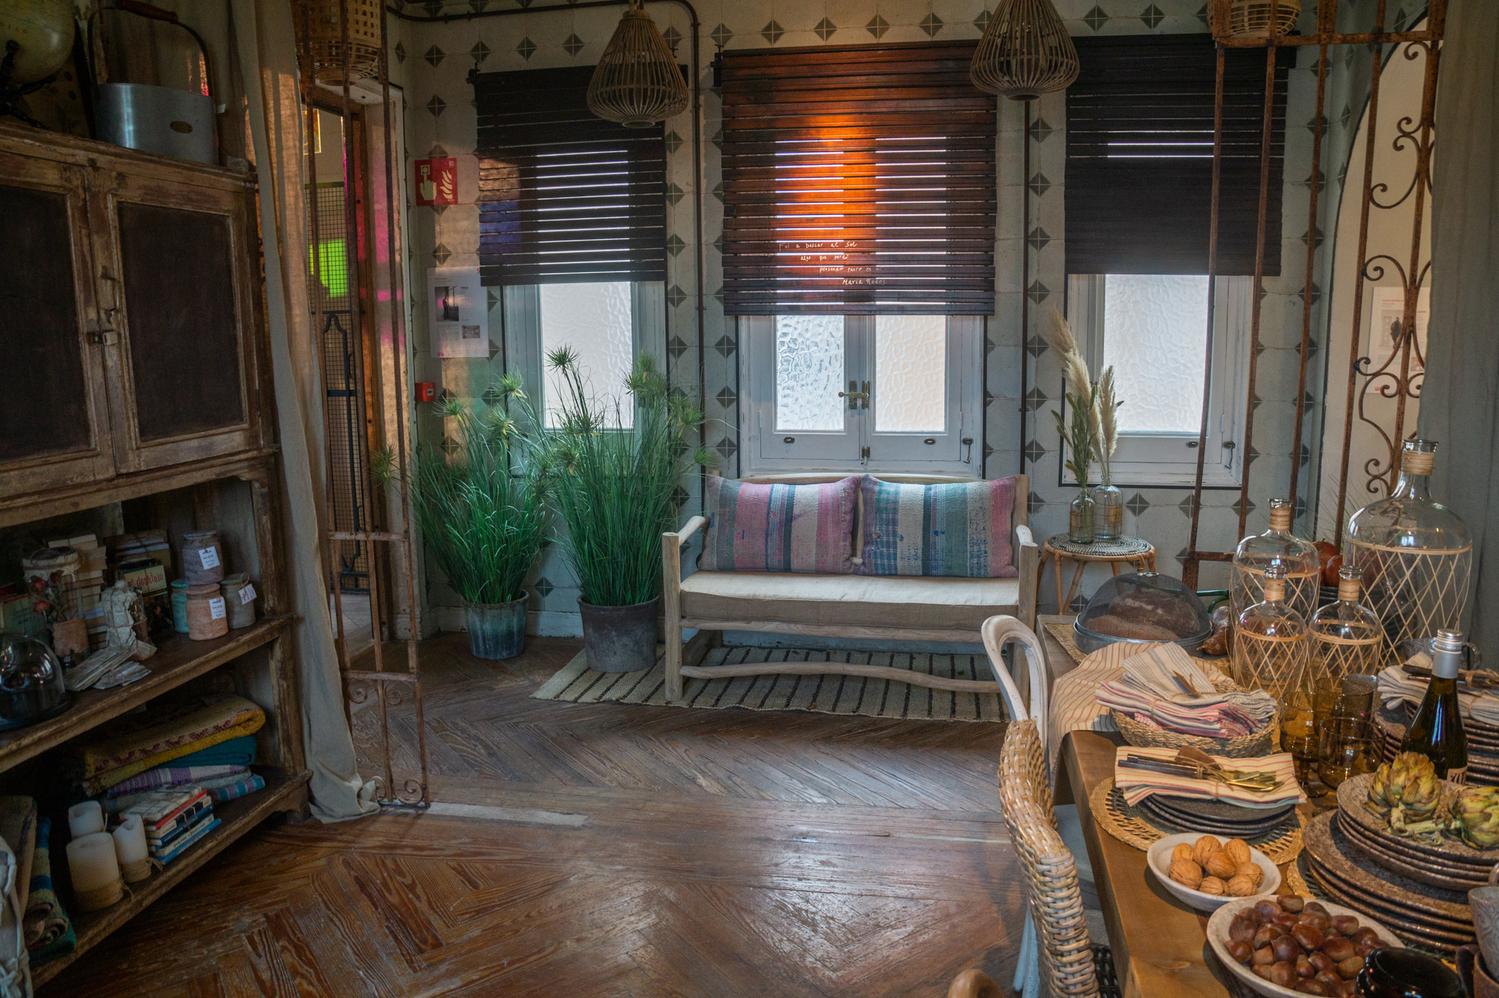 Francisco Segarra - Ofelia Home & Decor at Casa Decor 2019, Madrid